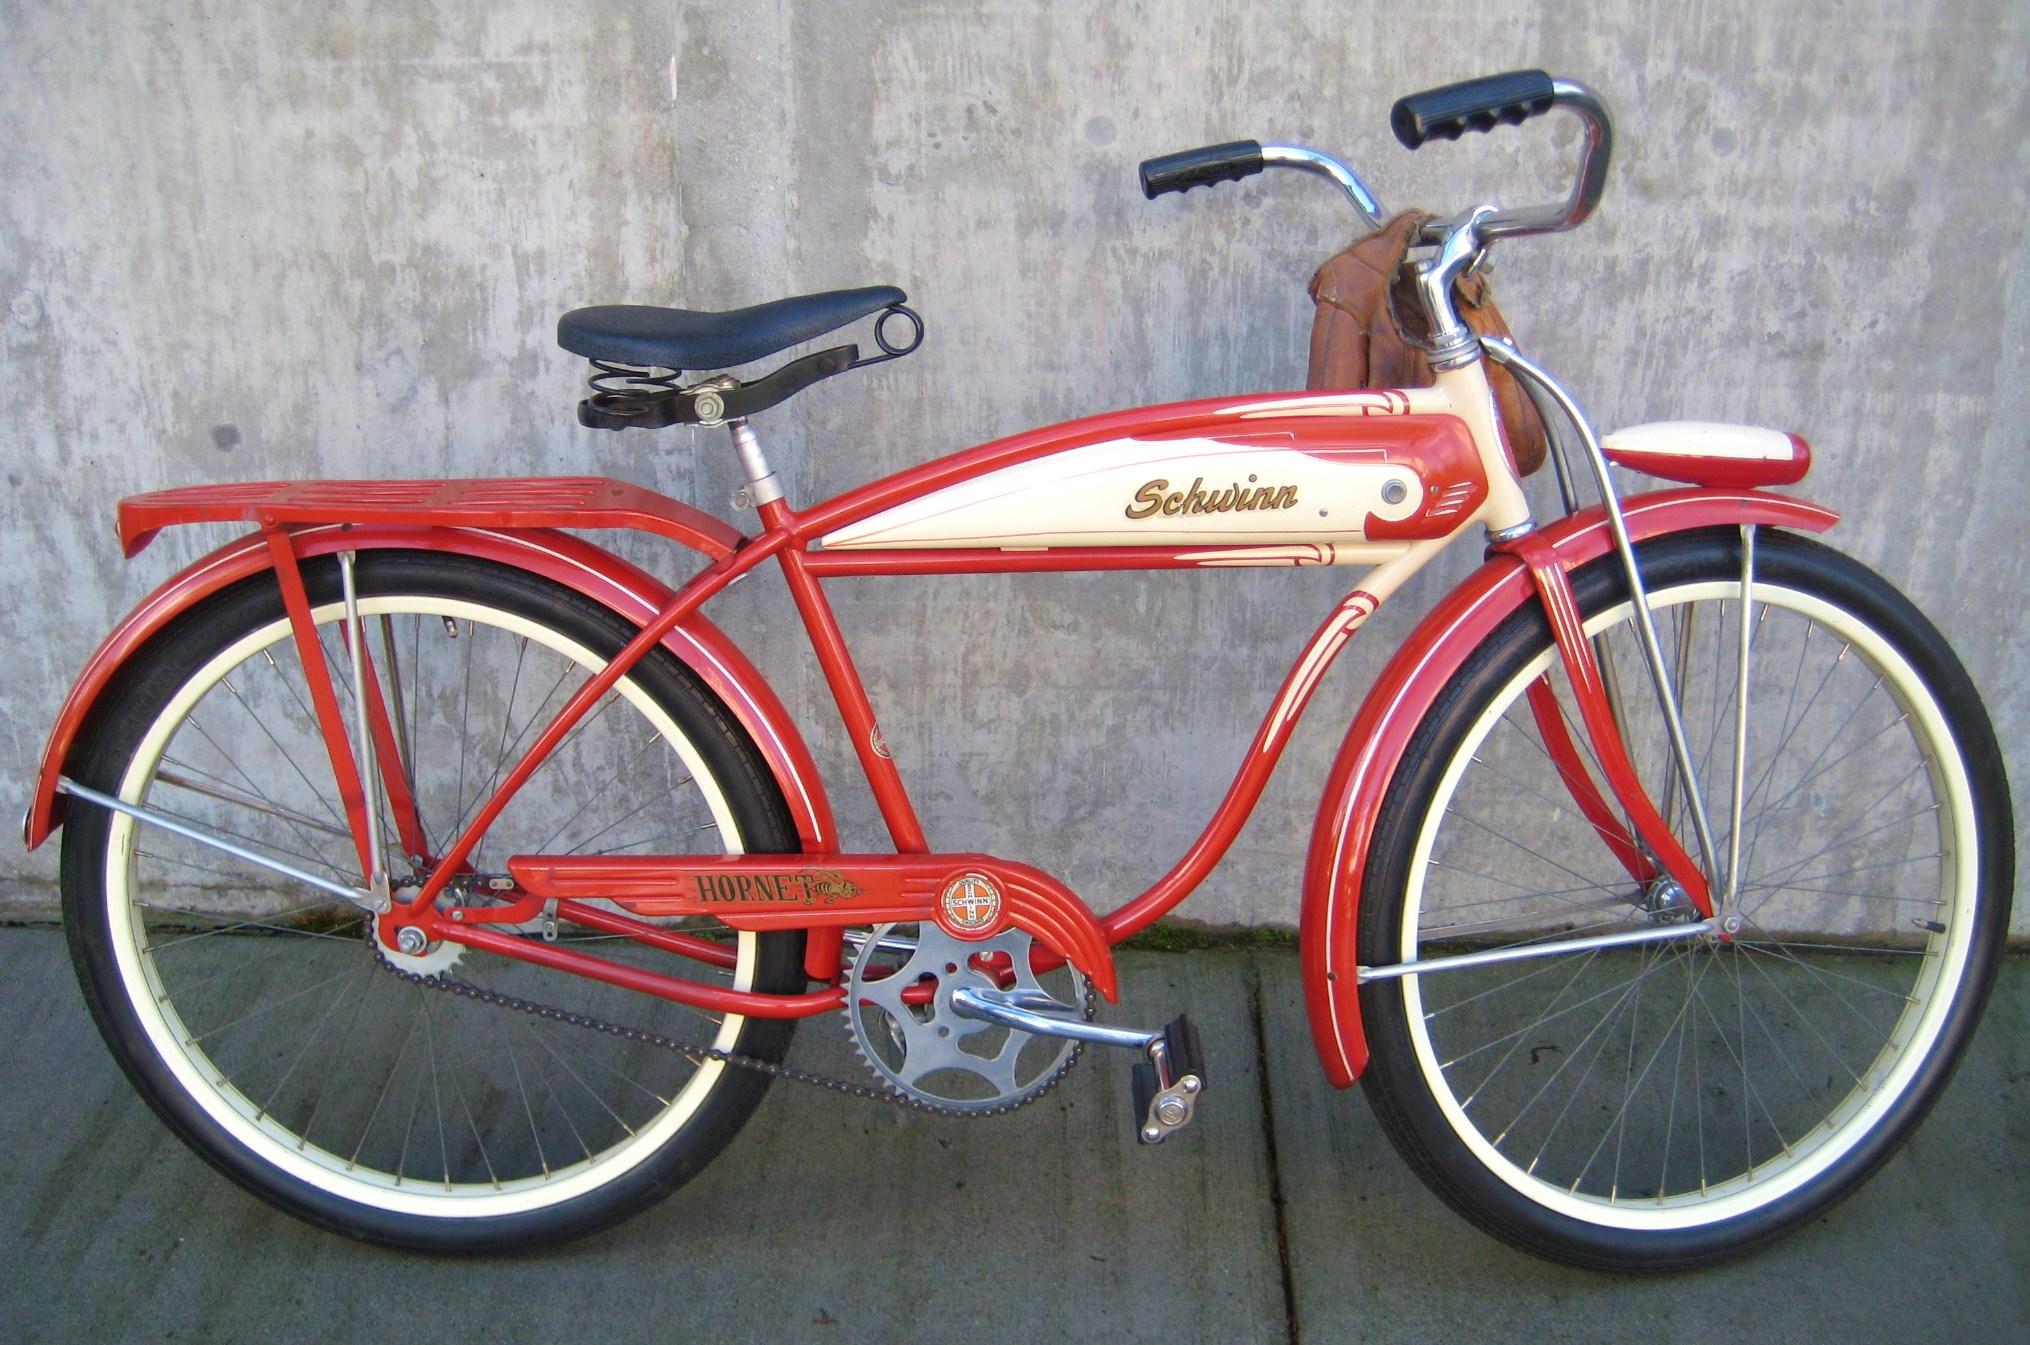 schwinn bicycles I have for sale a 1971 schwinn fastback bicycle original campus green paint single-speed, coaster bike has added vintage 67-68 ram's horn, stamped schwinn handlebars $250 together.